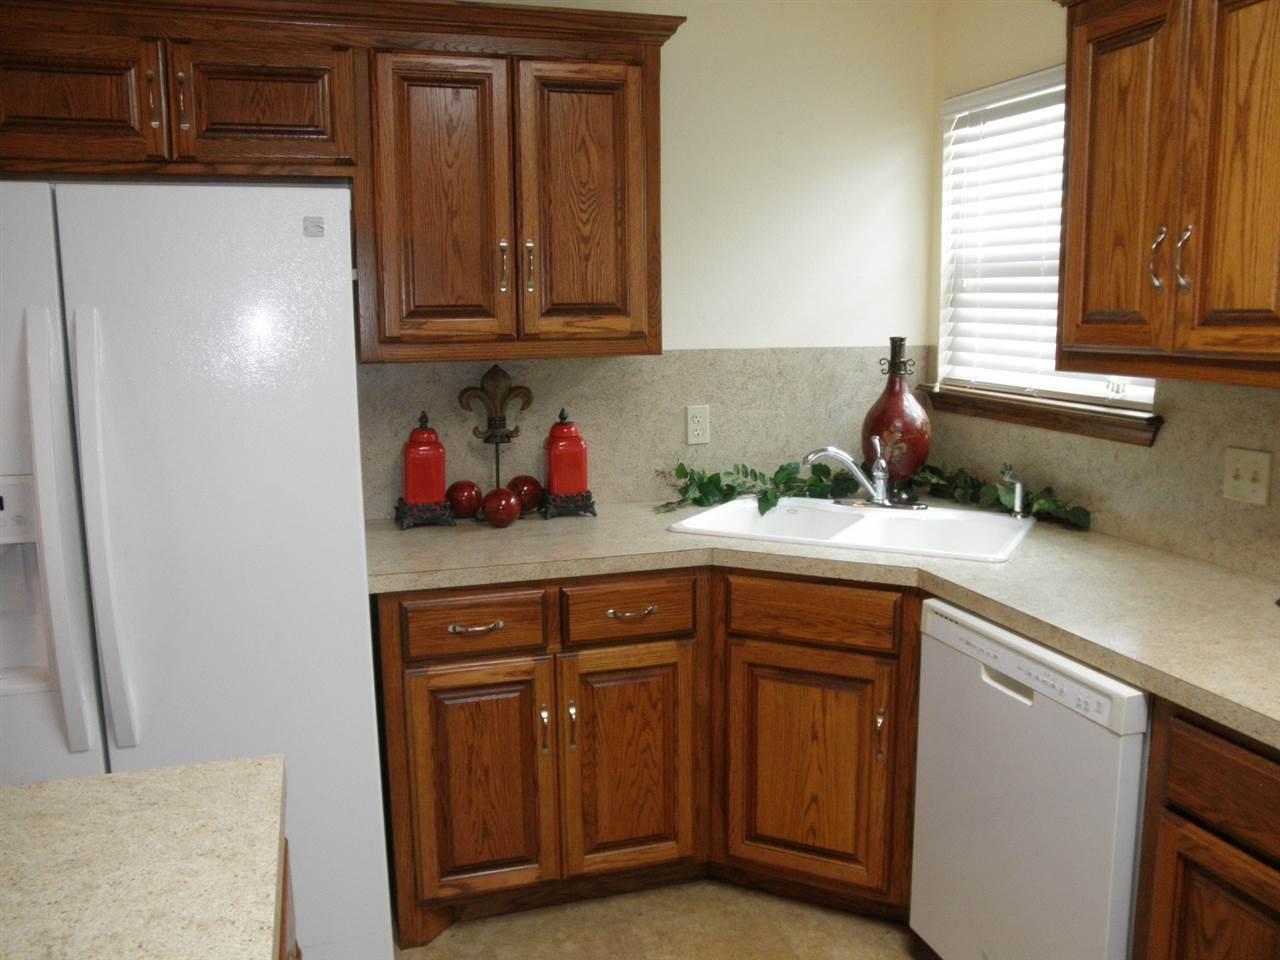 Sold Cross Sale W/ MLS | 1604 E Prospect  Ponca City, OK 74604 7